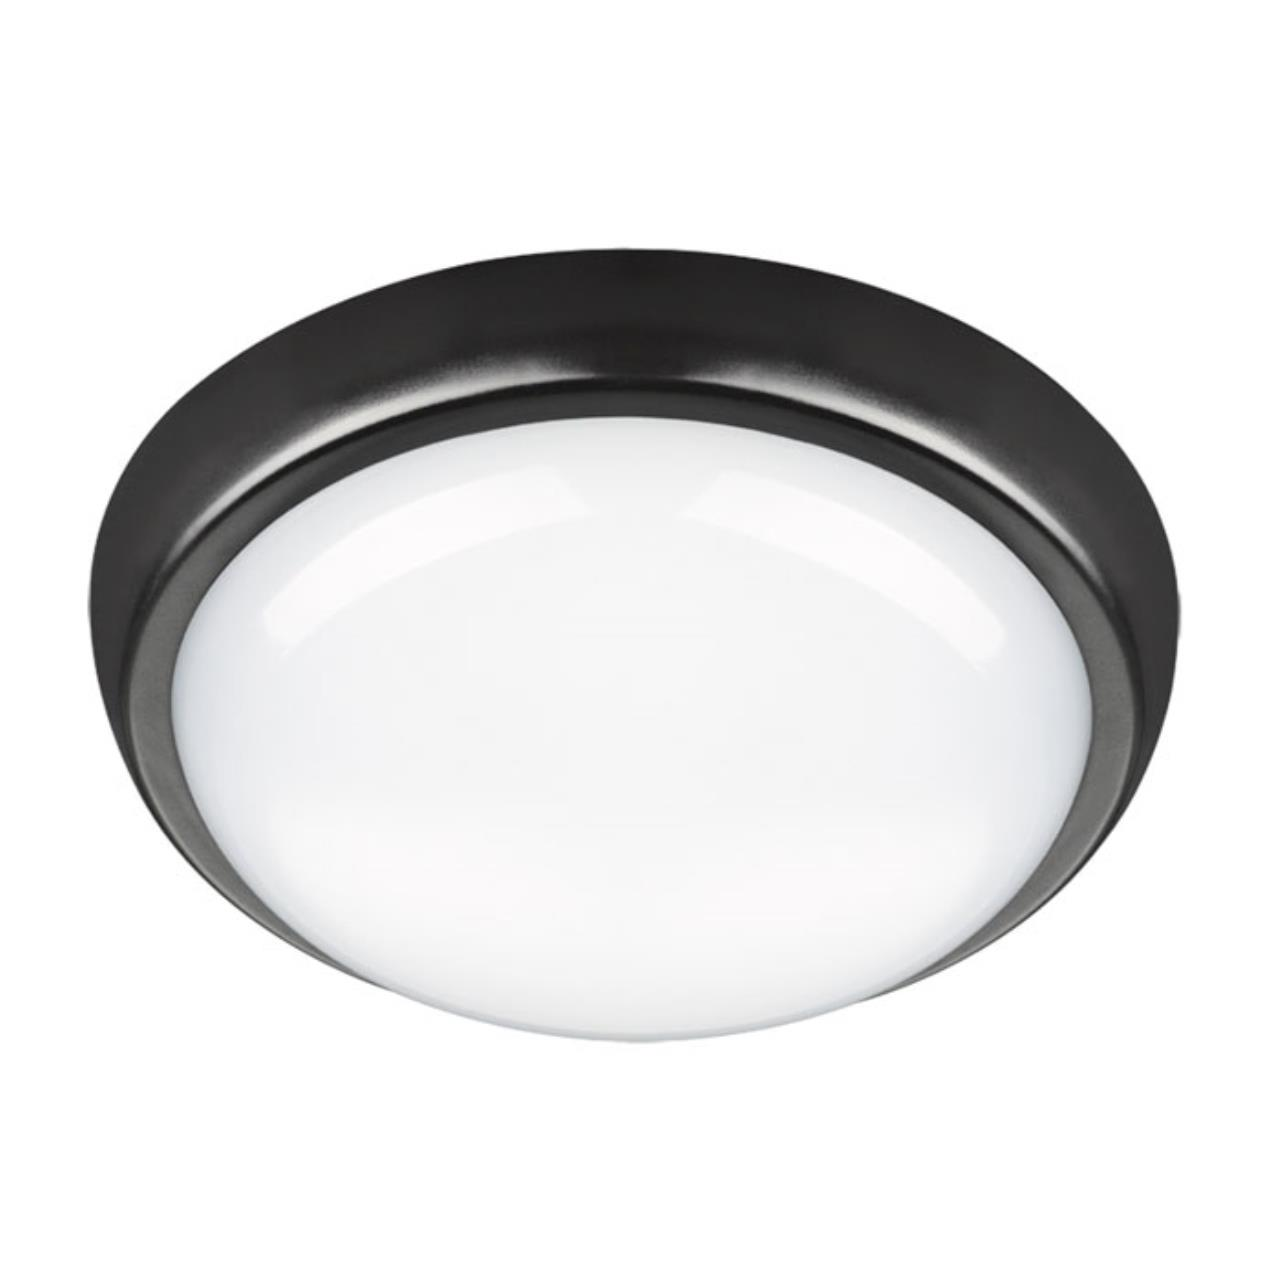 357505 STREET NT18 173 черный Ландшафтный светильник  IP54 LED 4000К 18W 220-240V OPAL